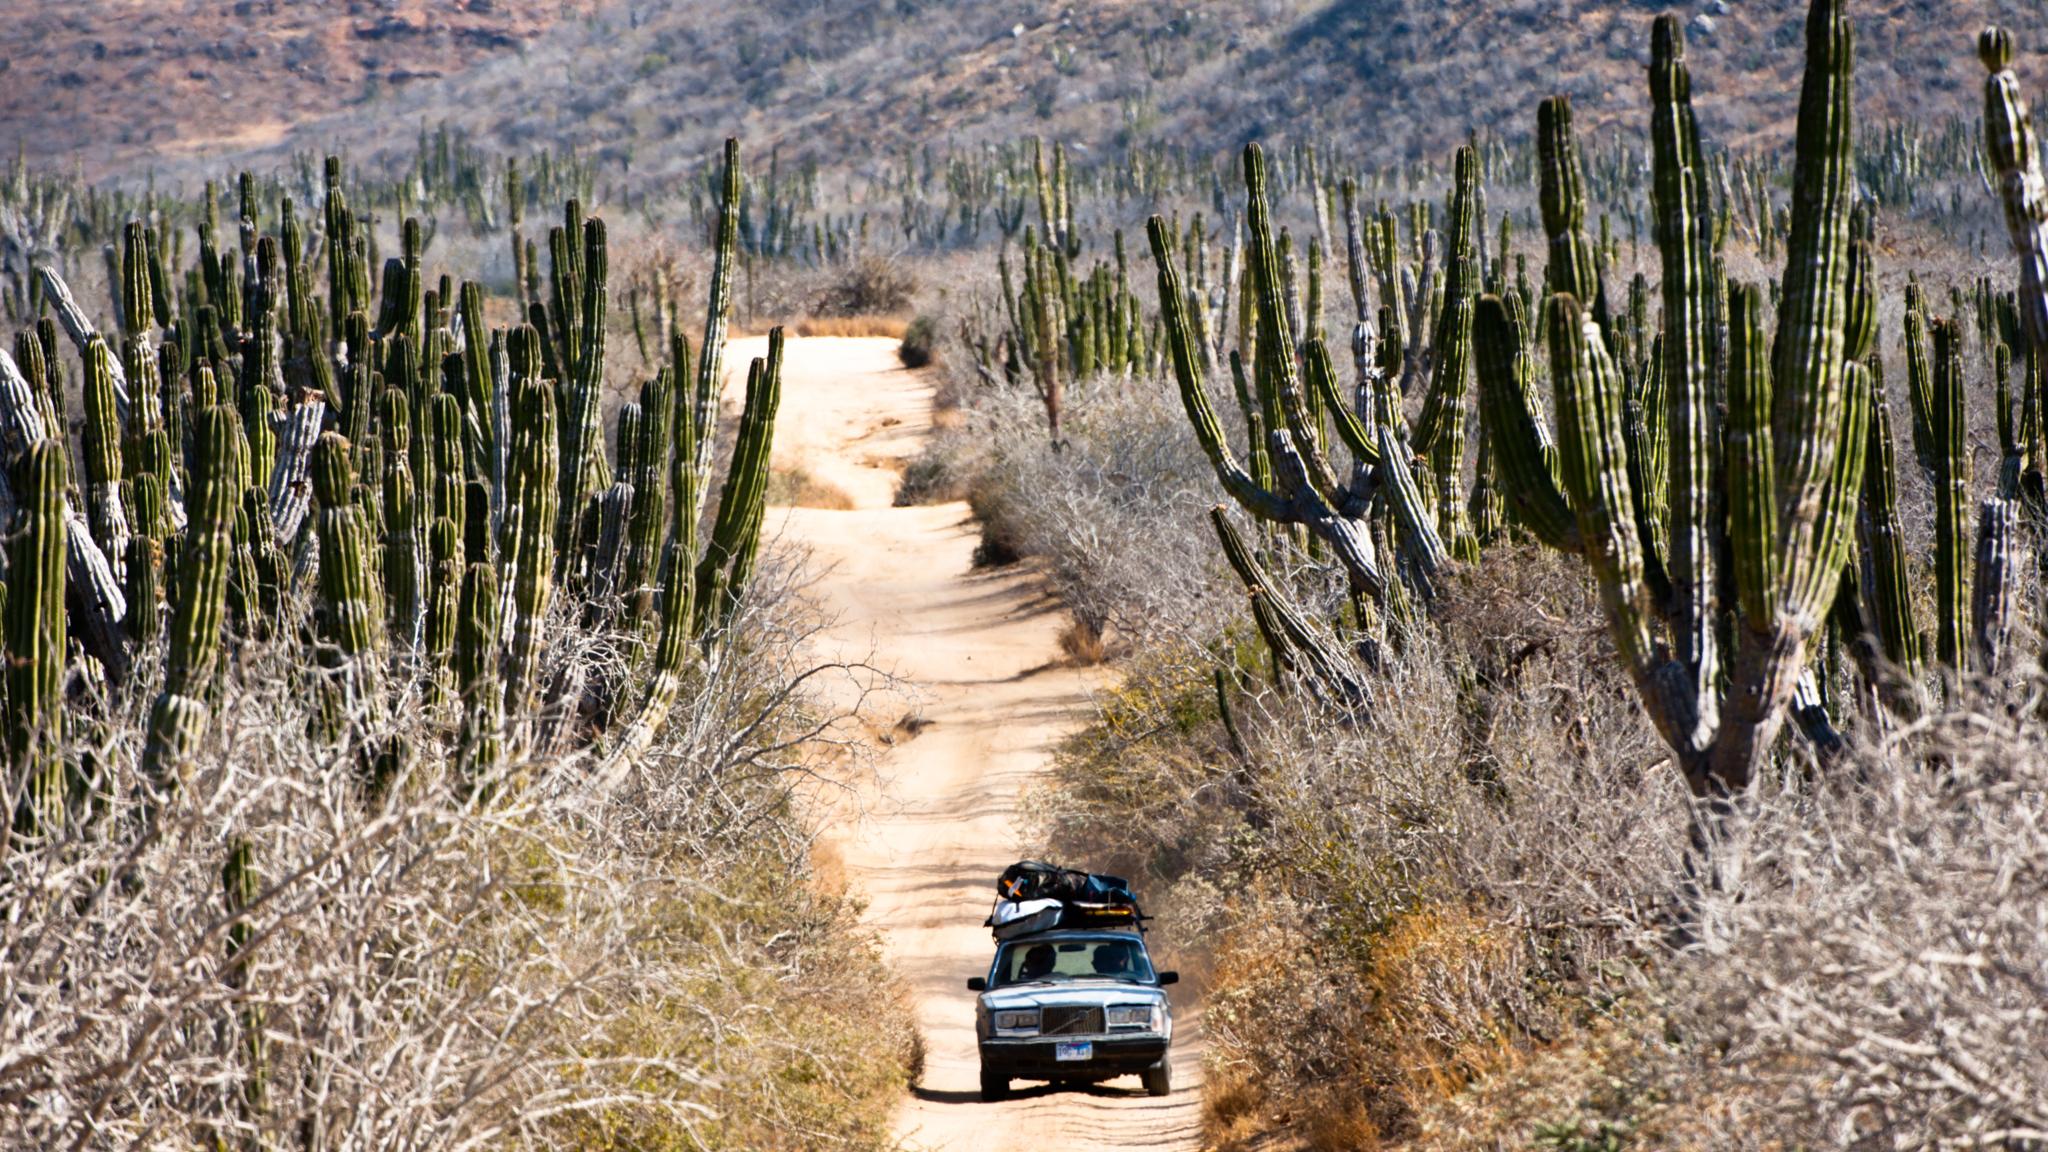 Baja Sur, Mexico